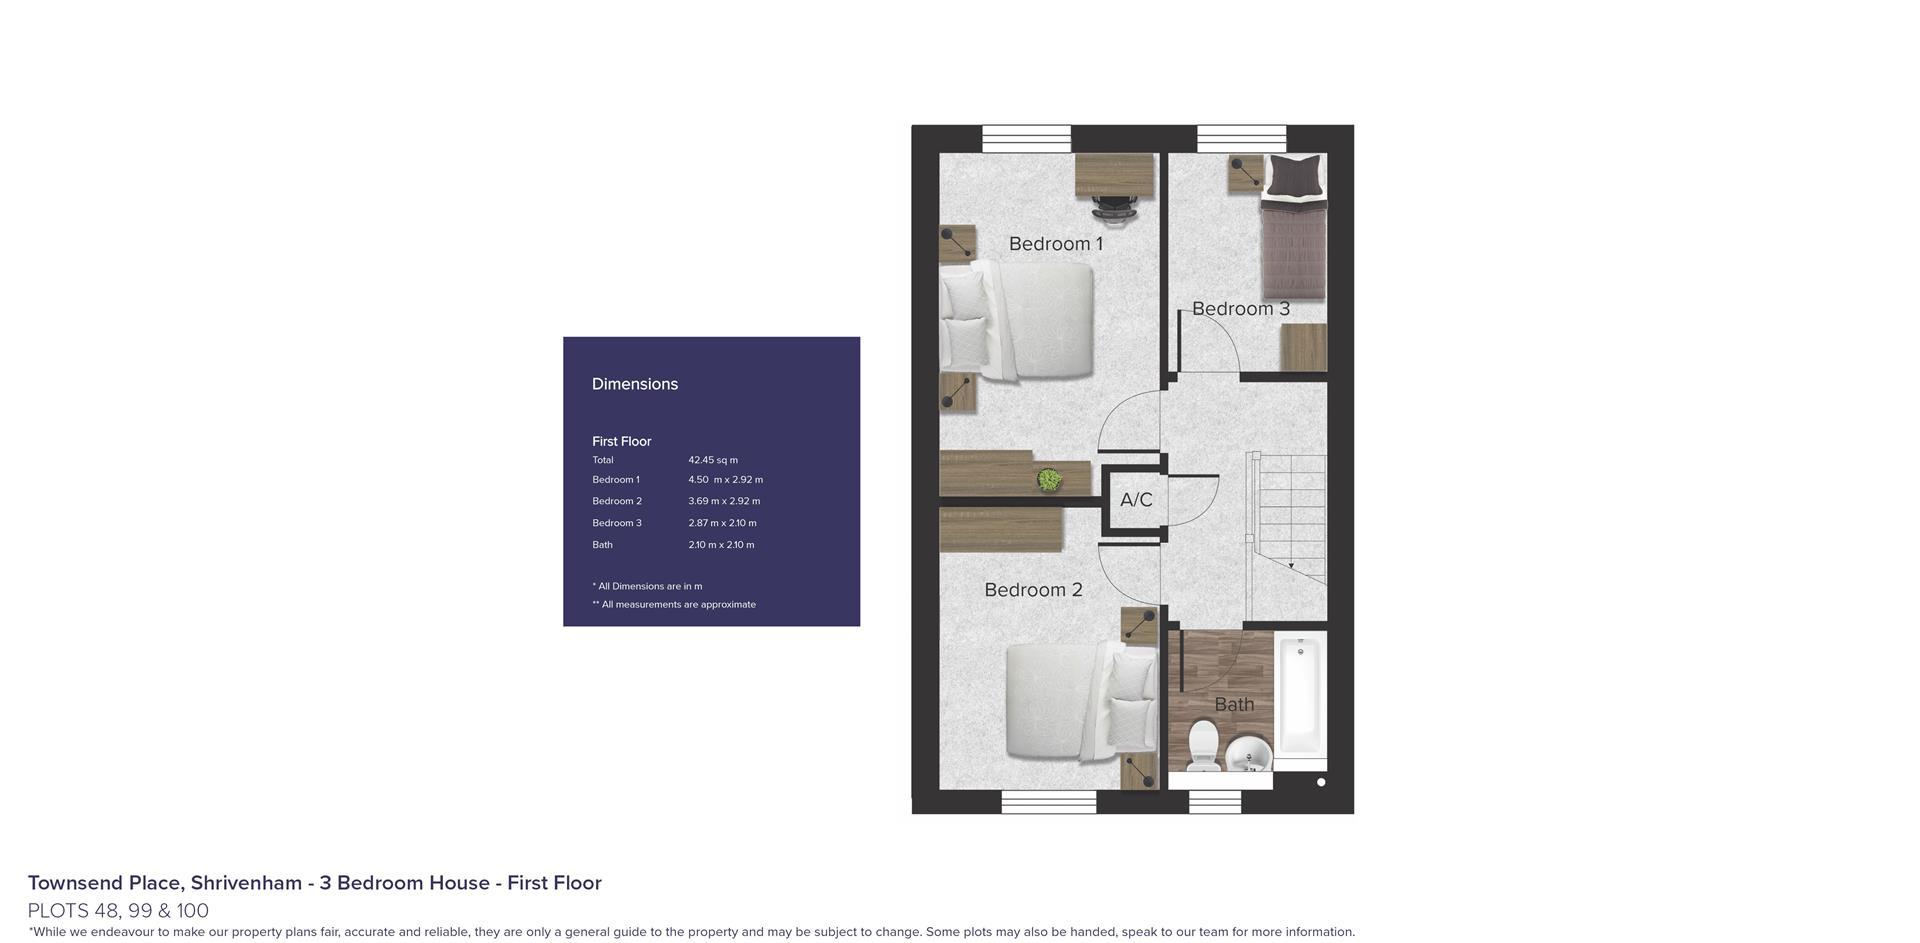 Townsend Place, Shrivenham_Plots 48, 99 & 100_FF_B